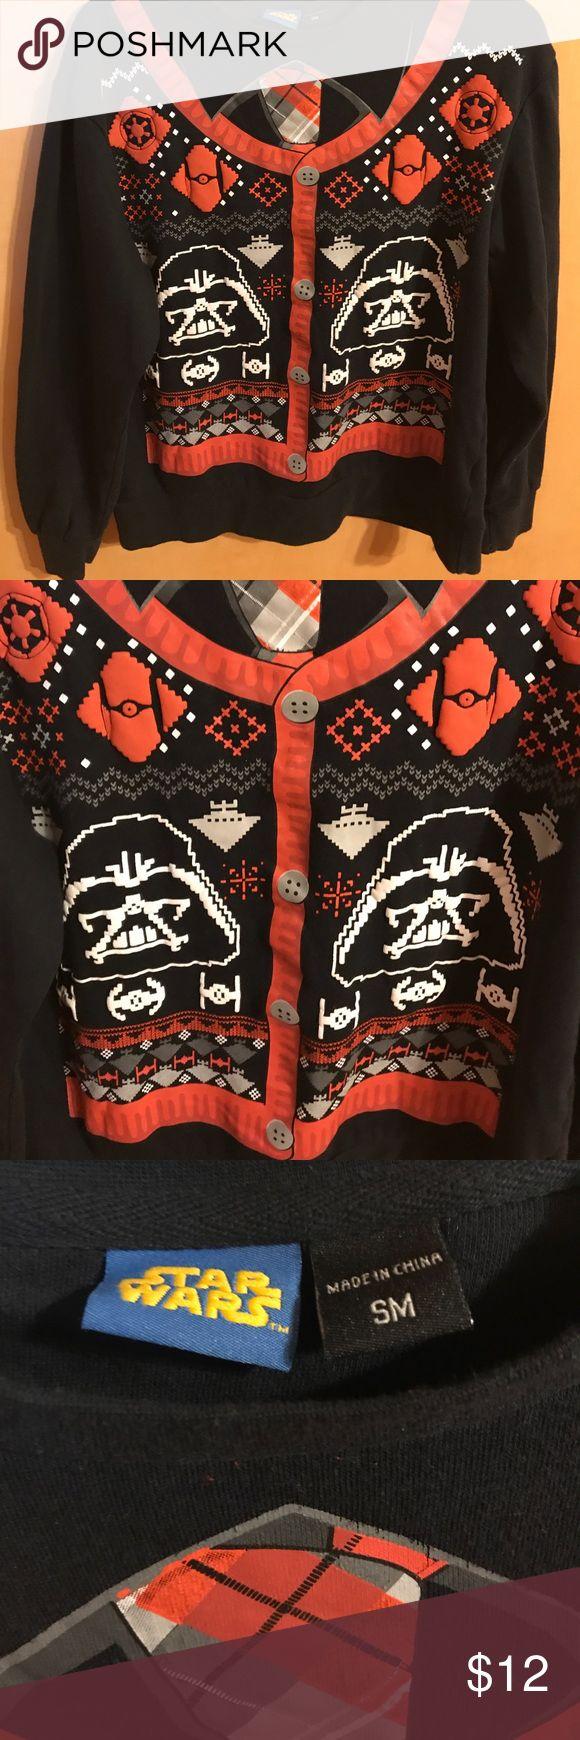 Star Wars sweatshirt  size sm could be unisex Star Wars sweatshirt size sm could be unisex Star Wars Shirts Sweatshirts & Hoodies